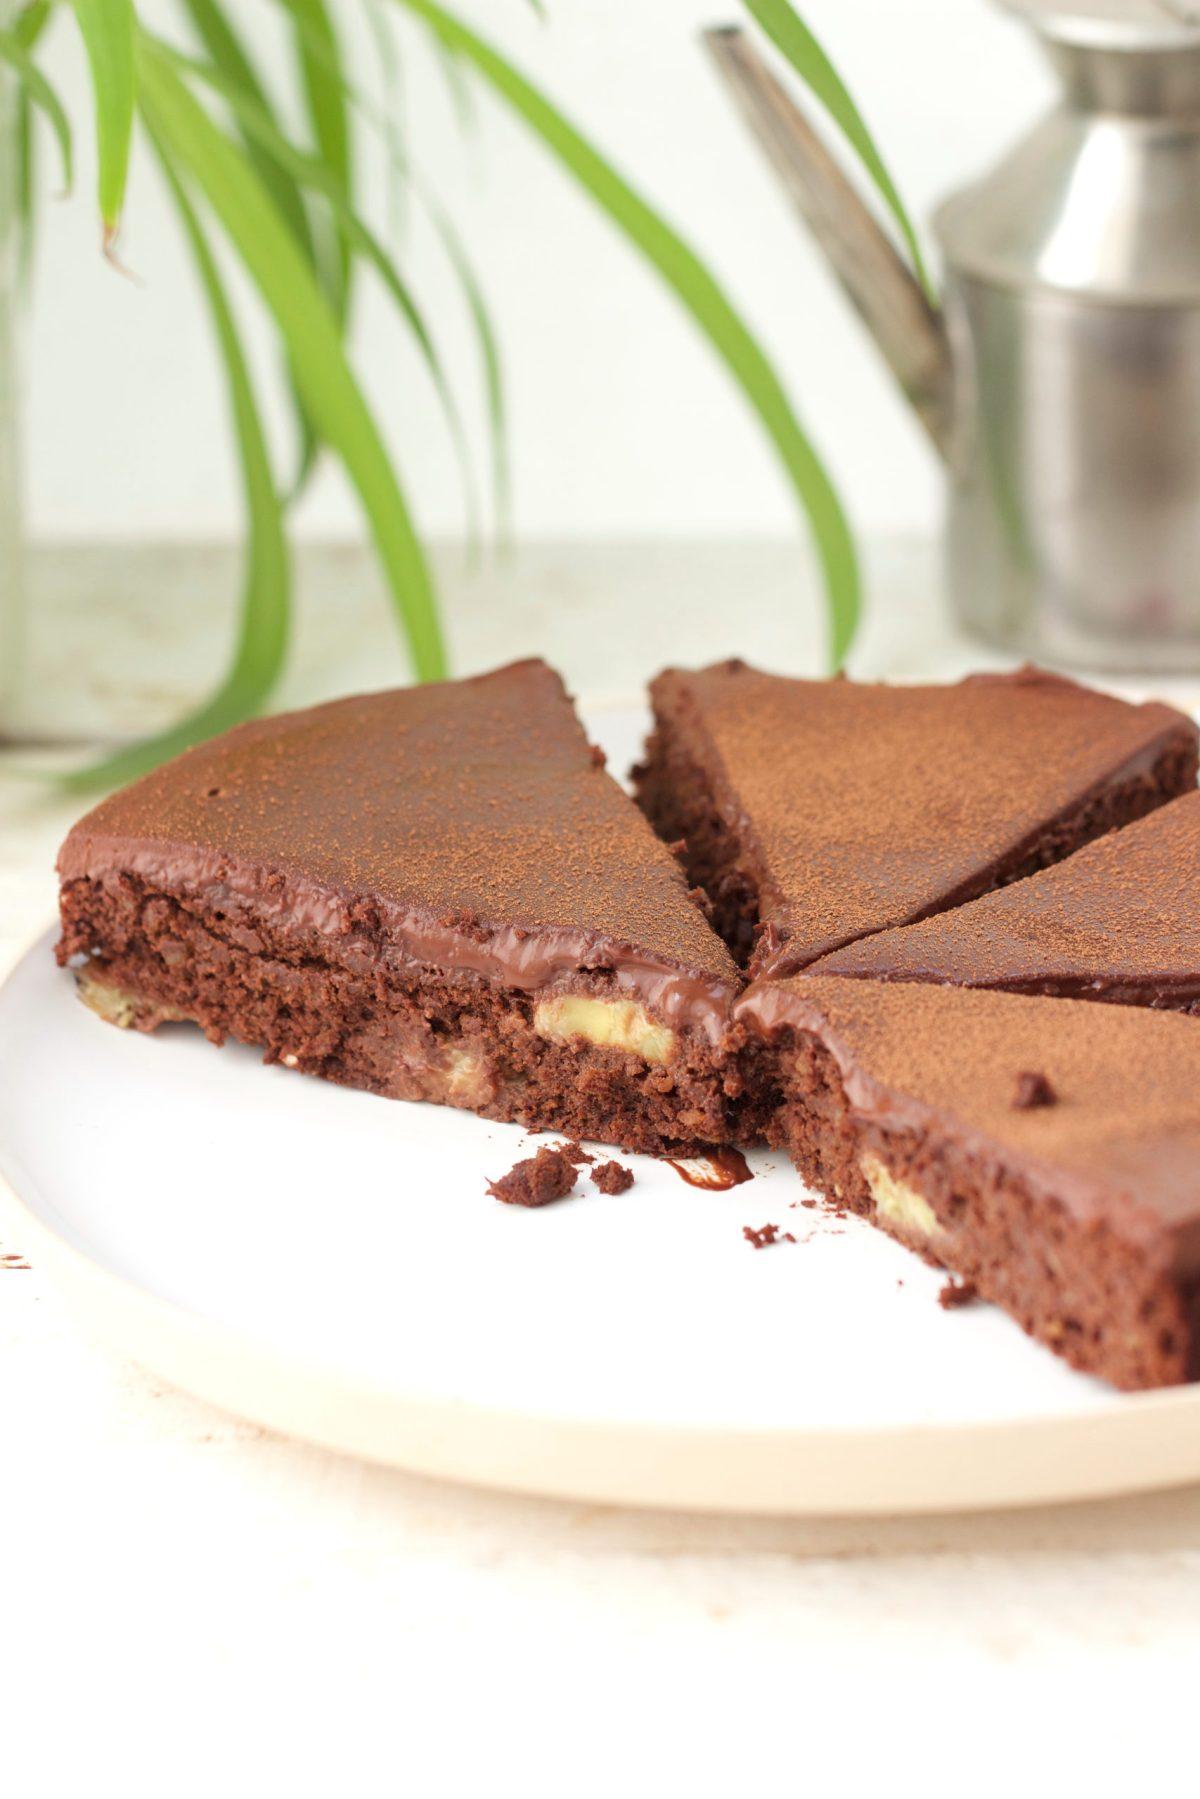 Moelleux chocolat banane, vegan, sans gluten, sans sucre